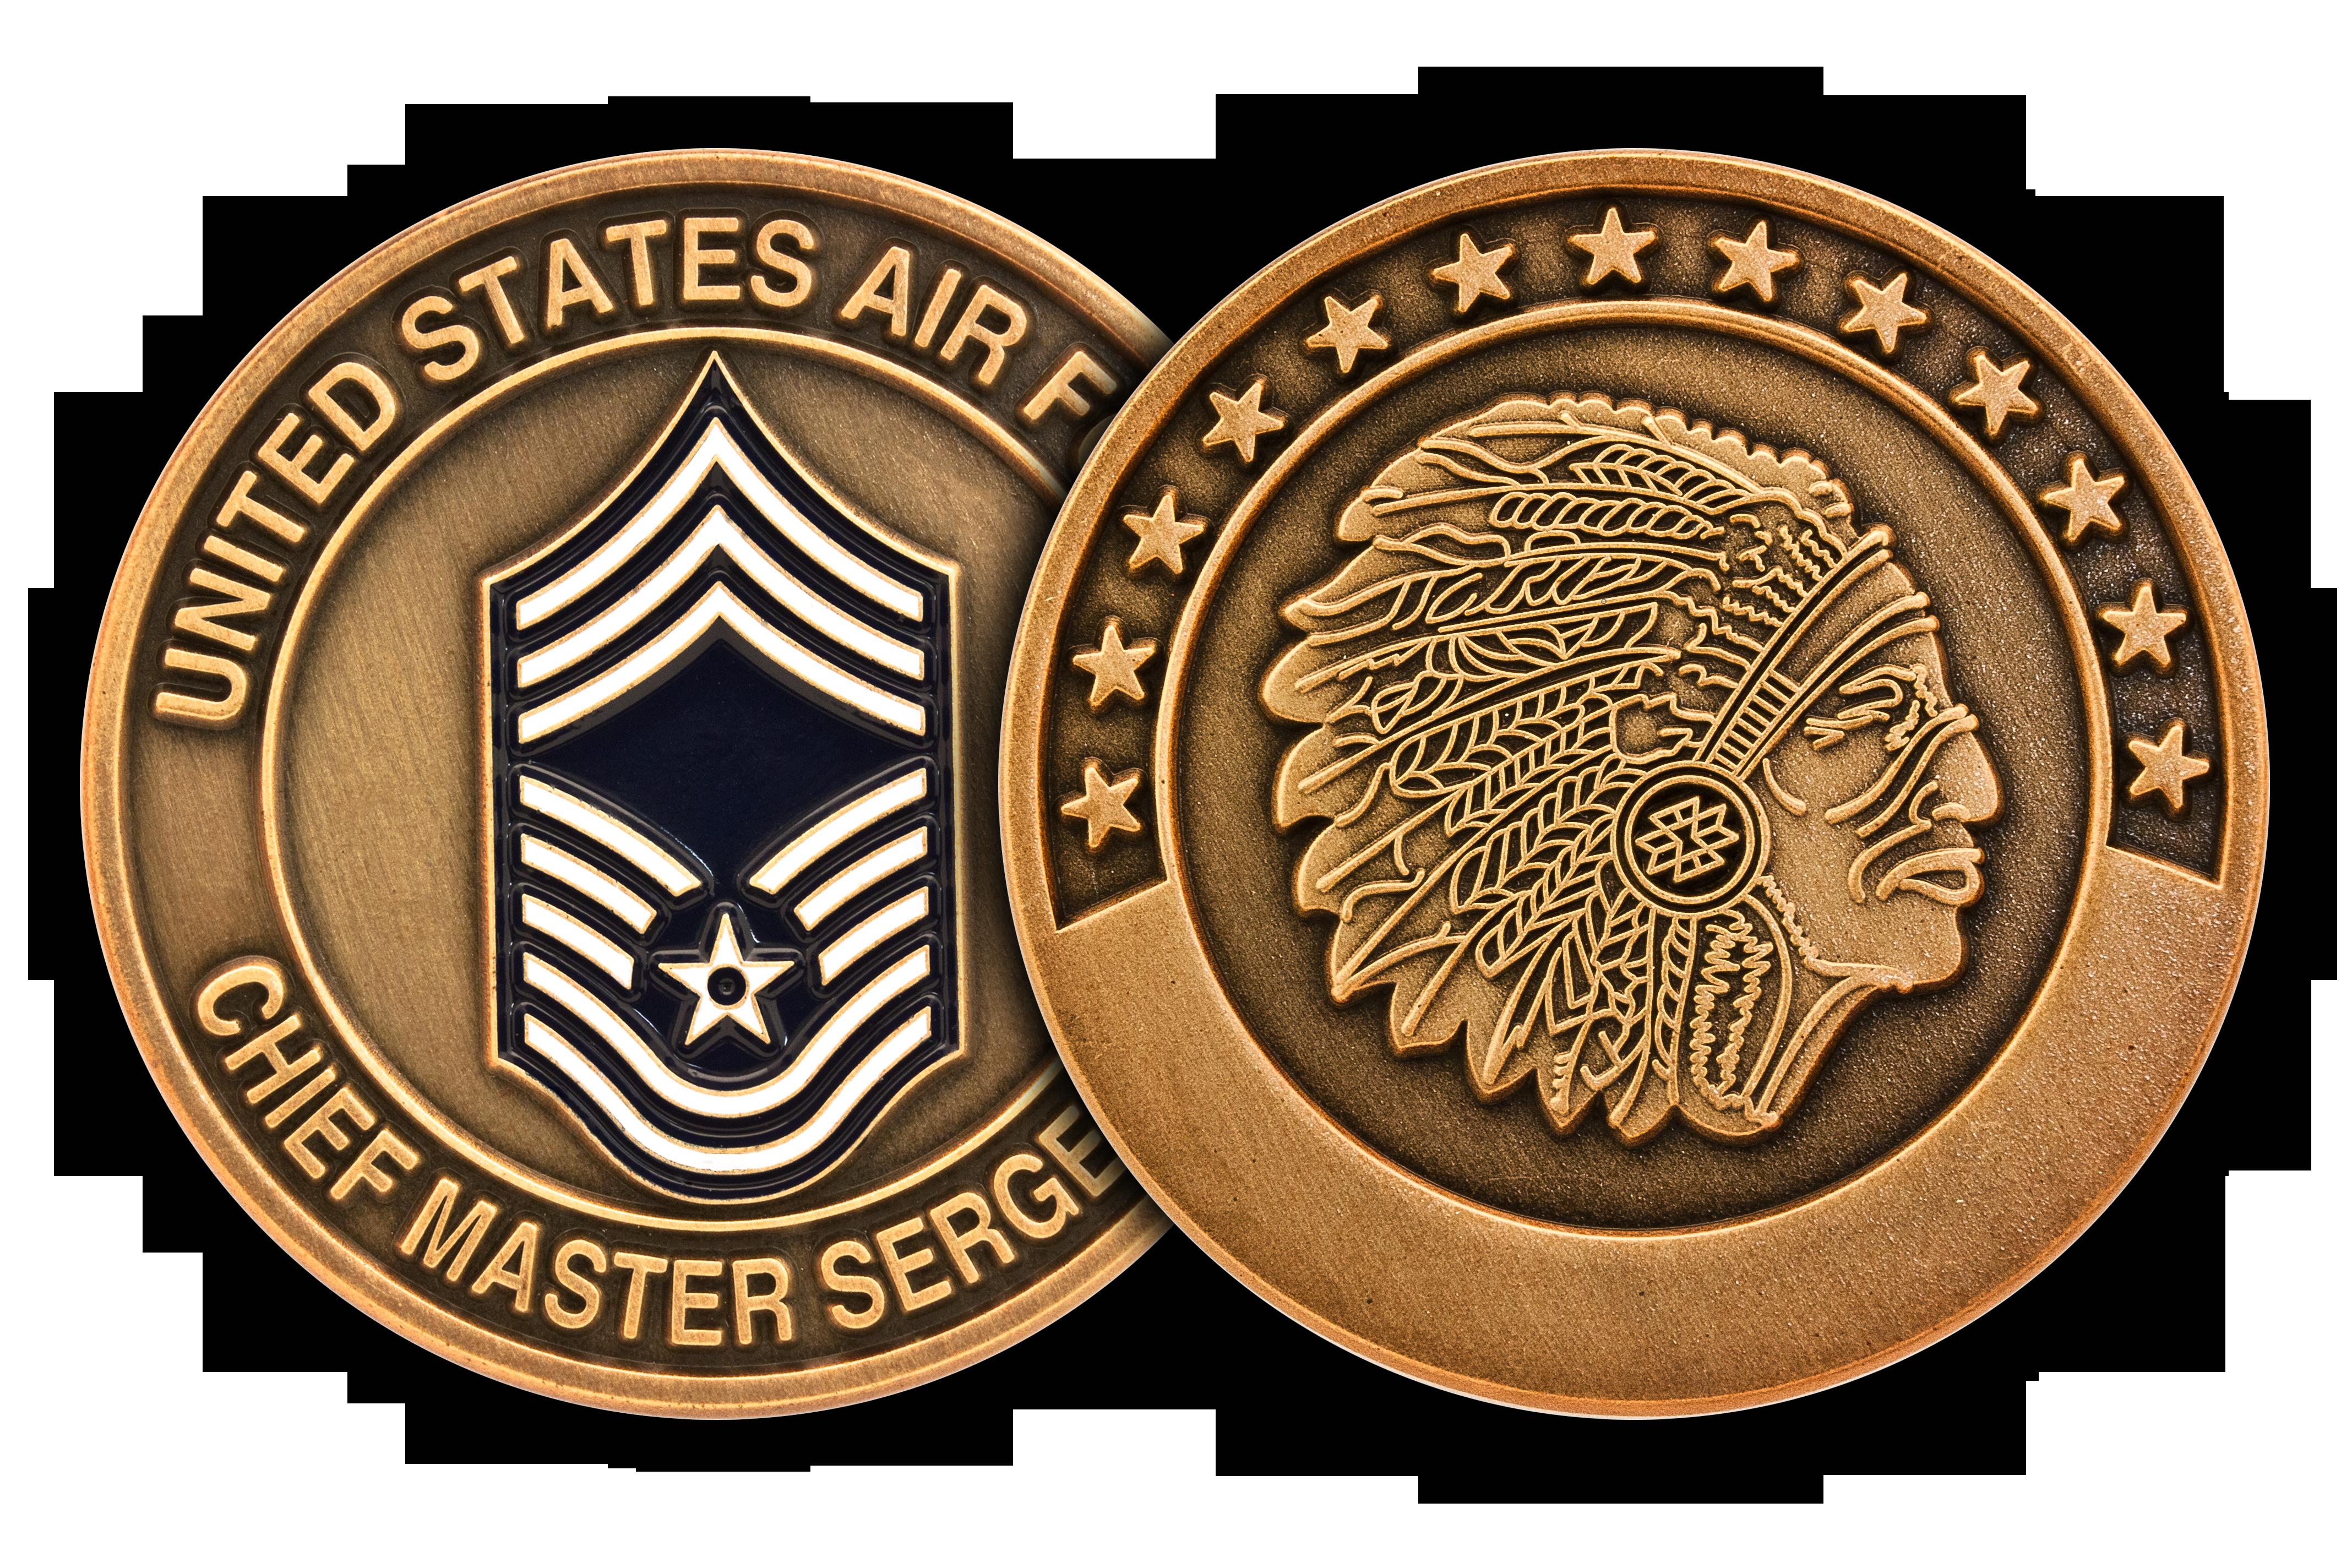 Chief Master Sergeant Bronze Challenge Coin, Engravable